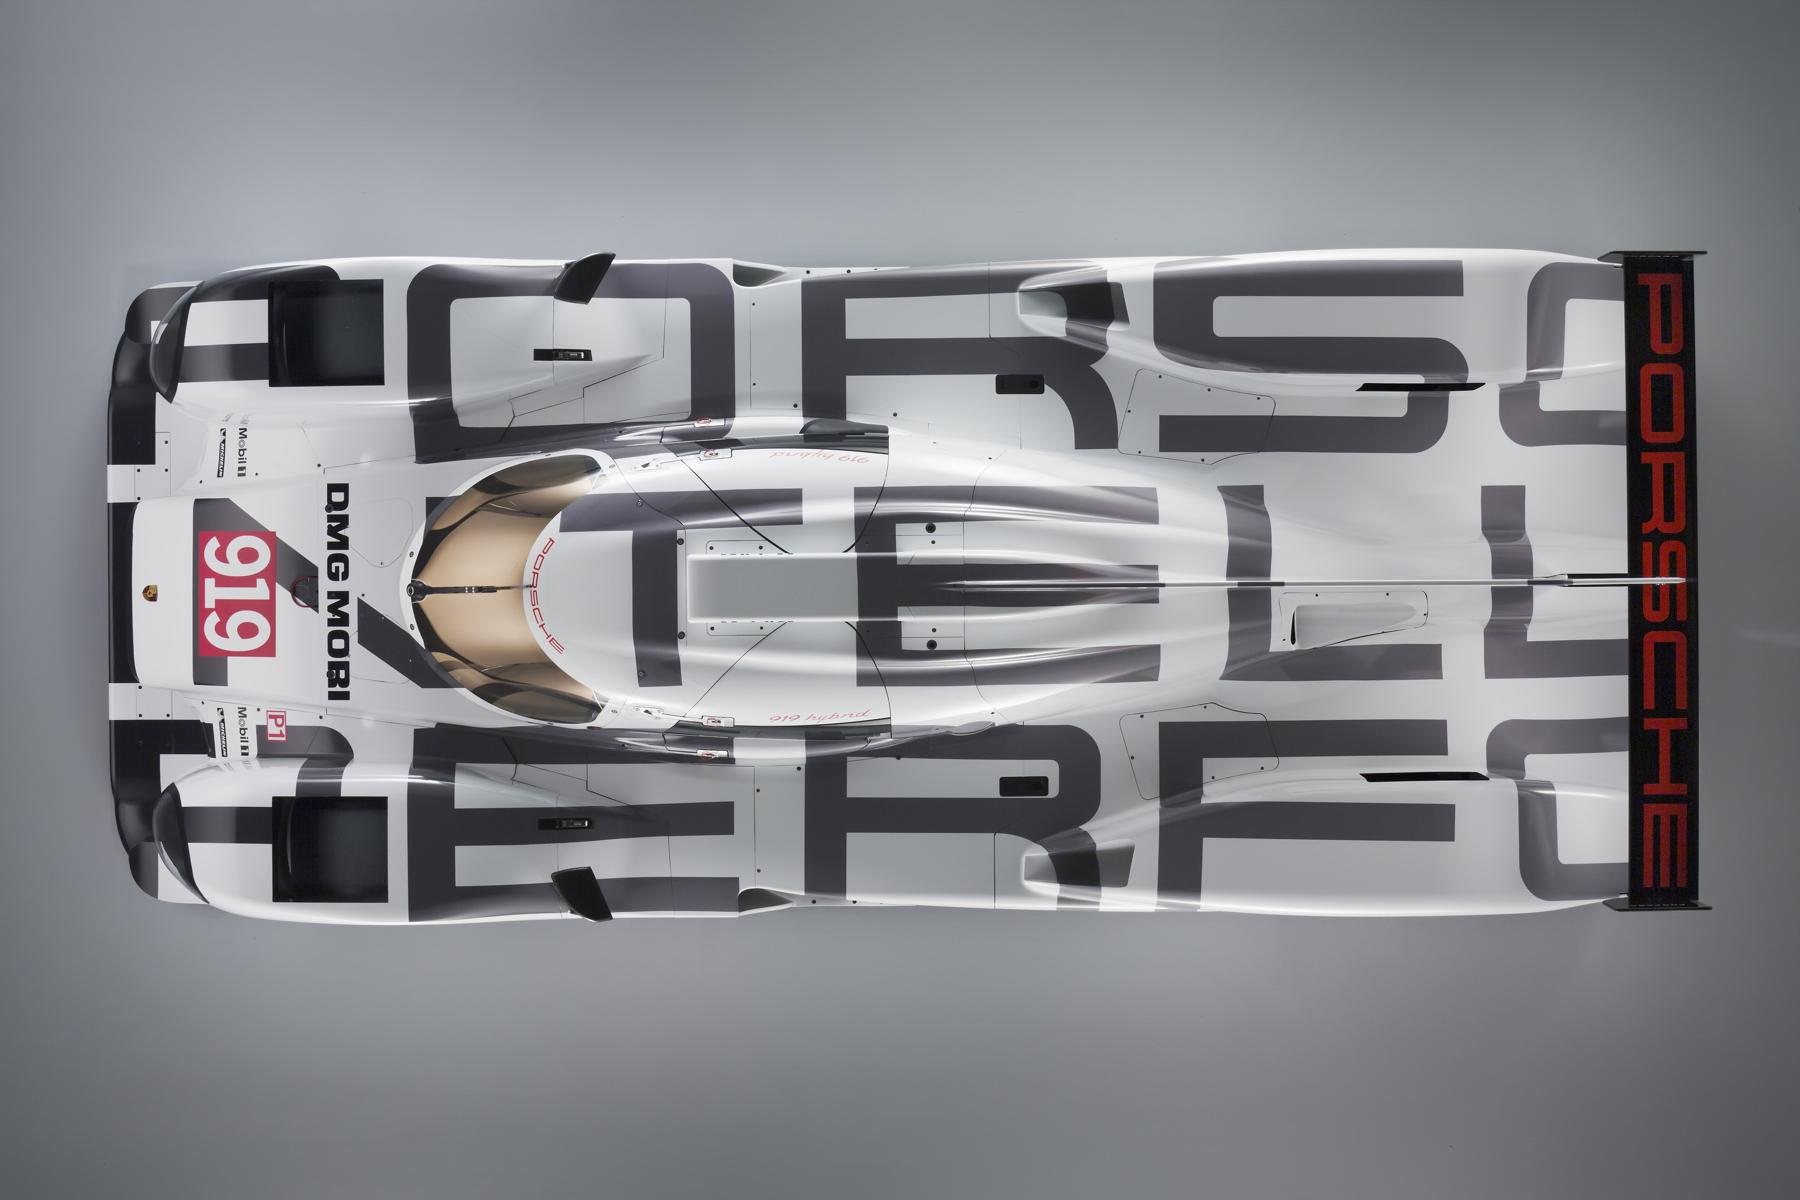 https://t911.wpengine.com/wp-content/uploads/2014/03/2014-Porsche-Motorsport-Porsche-919-Hybrid-Overhead-Horizontal.jpg